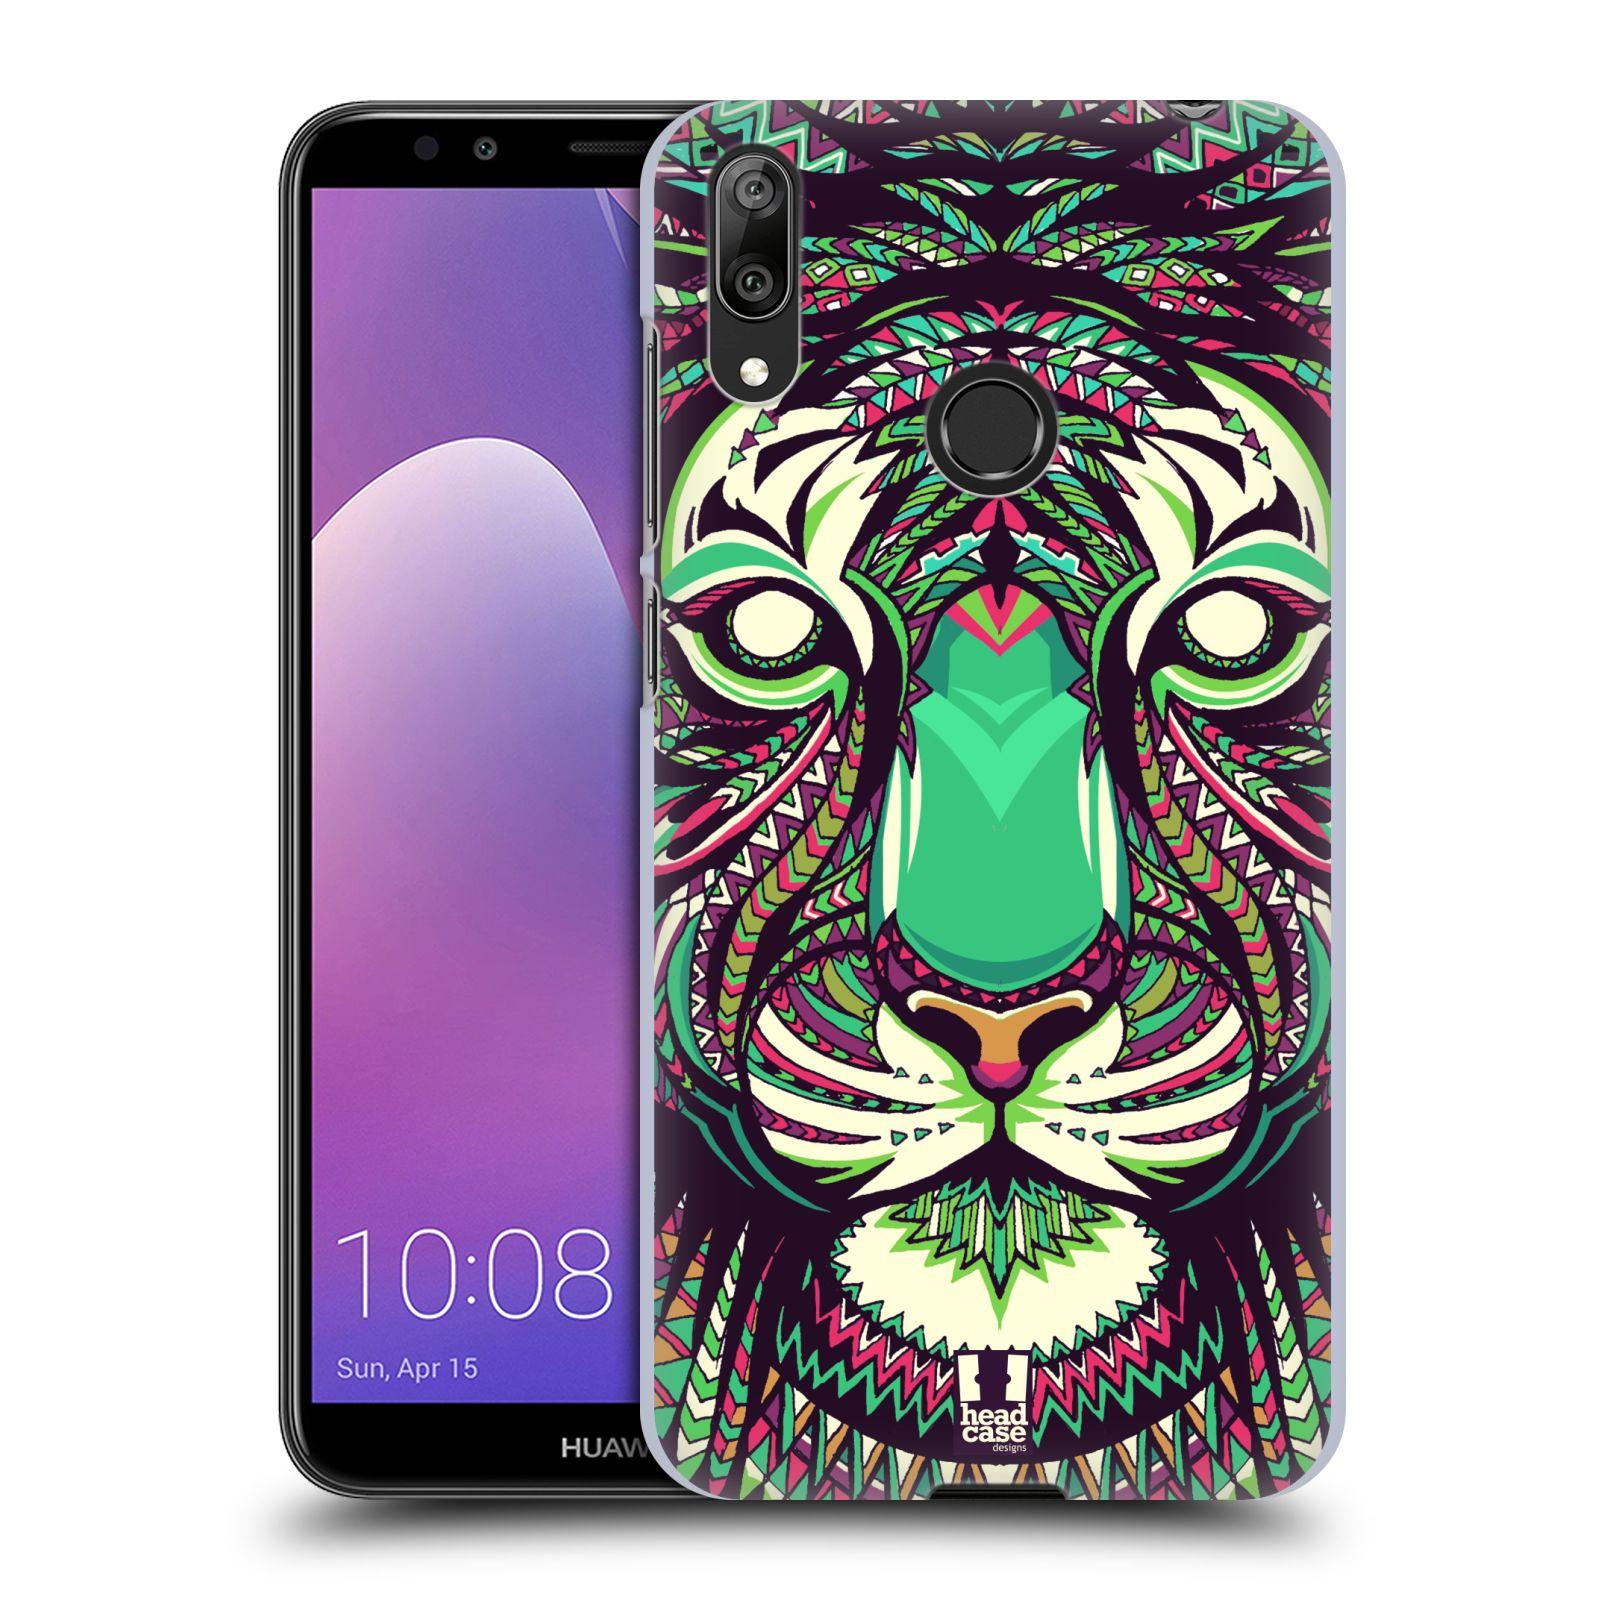 Plastové pouzdro na mobil Huawei Y7 (2019) - Head Case - AZTEC TYGR